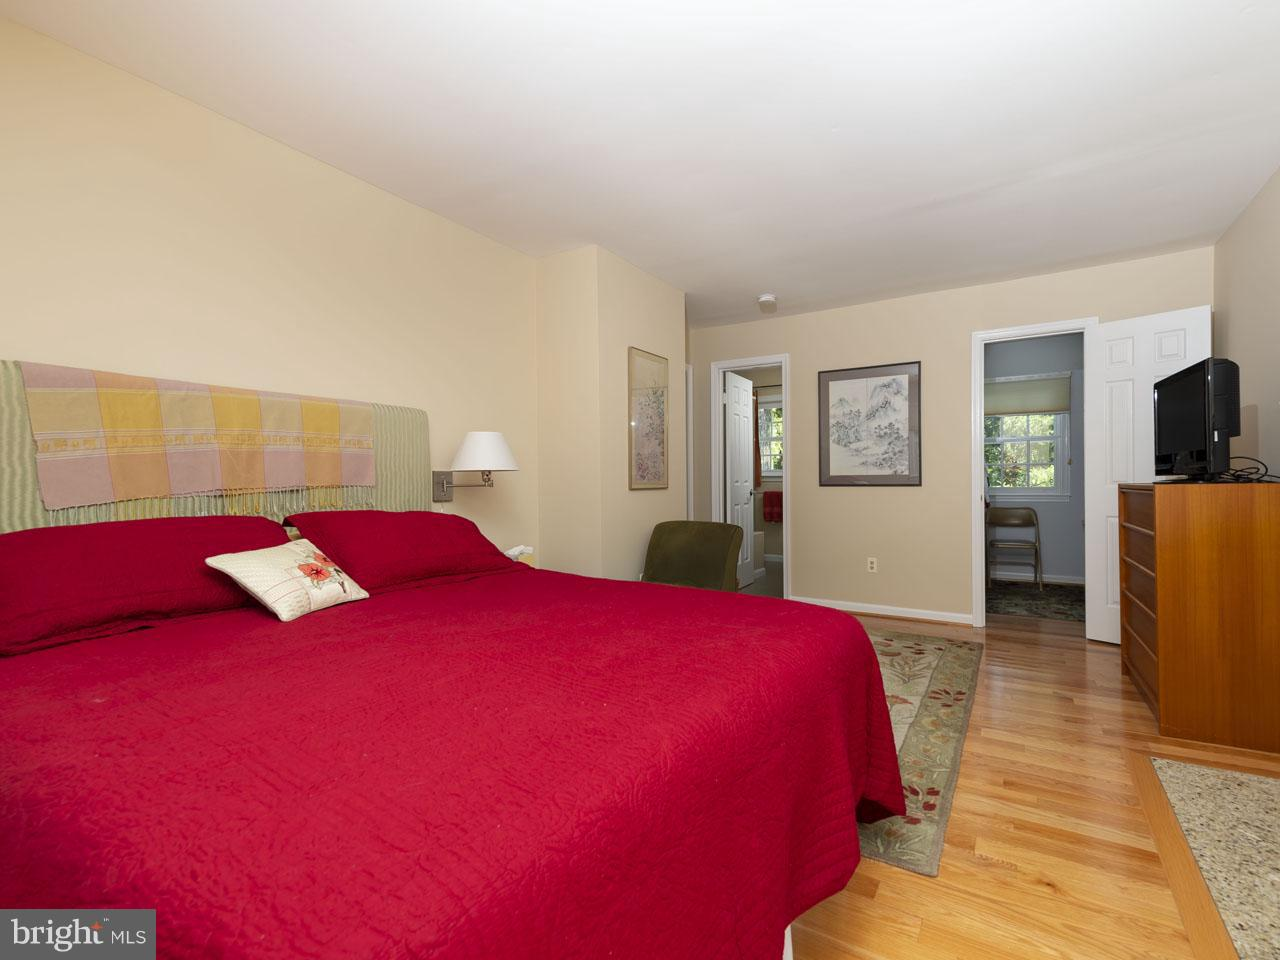 1006211278-300688039103-2021-07-22-07-39-39        Burke Delaware Real Estate For Sale   MLS# 1006211278  - Best of Northern Virginia